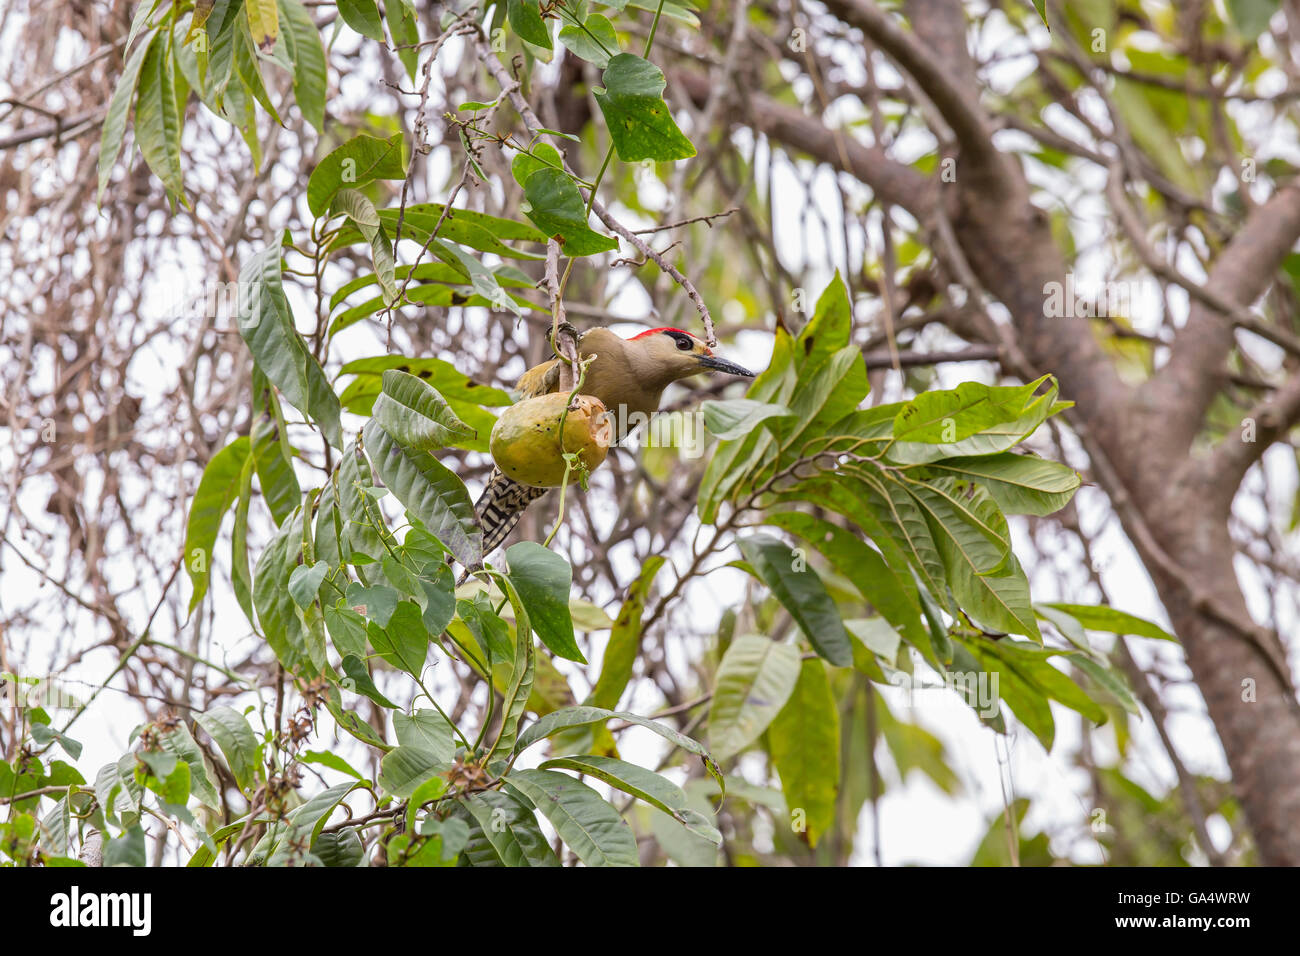 West Indian Woodpecker (Melanerpes superciliaris) in tree near Hacienda La Belen, a ranch and bird reserve near - Stock Image